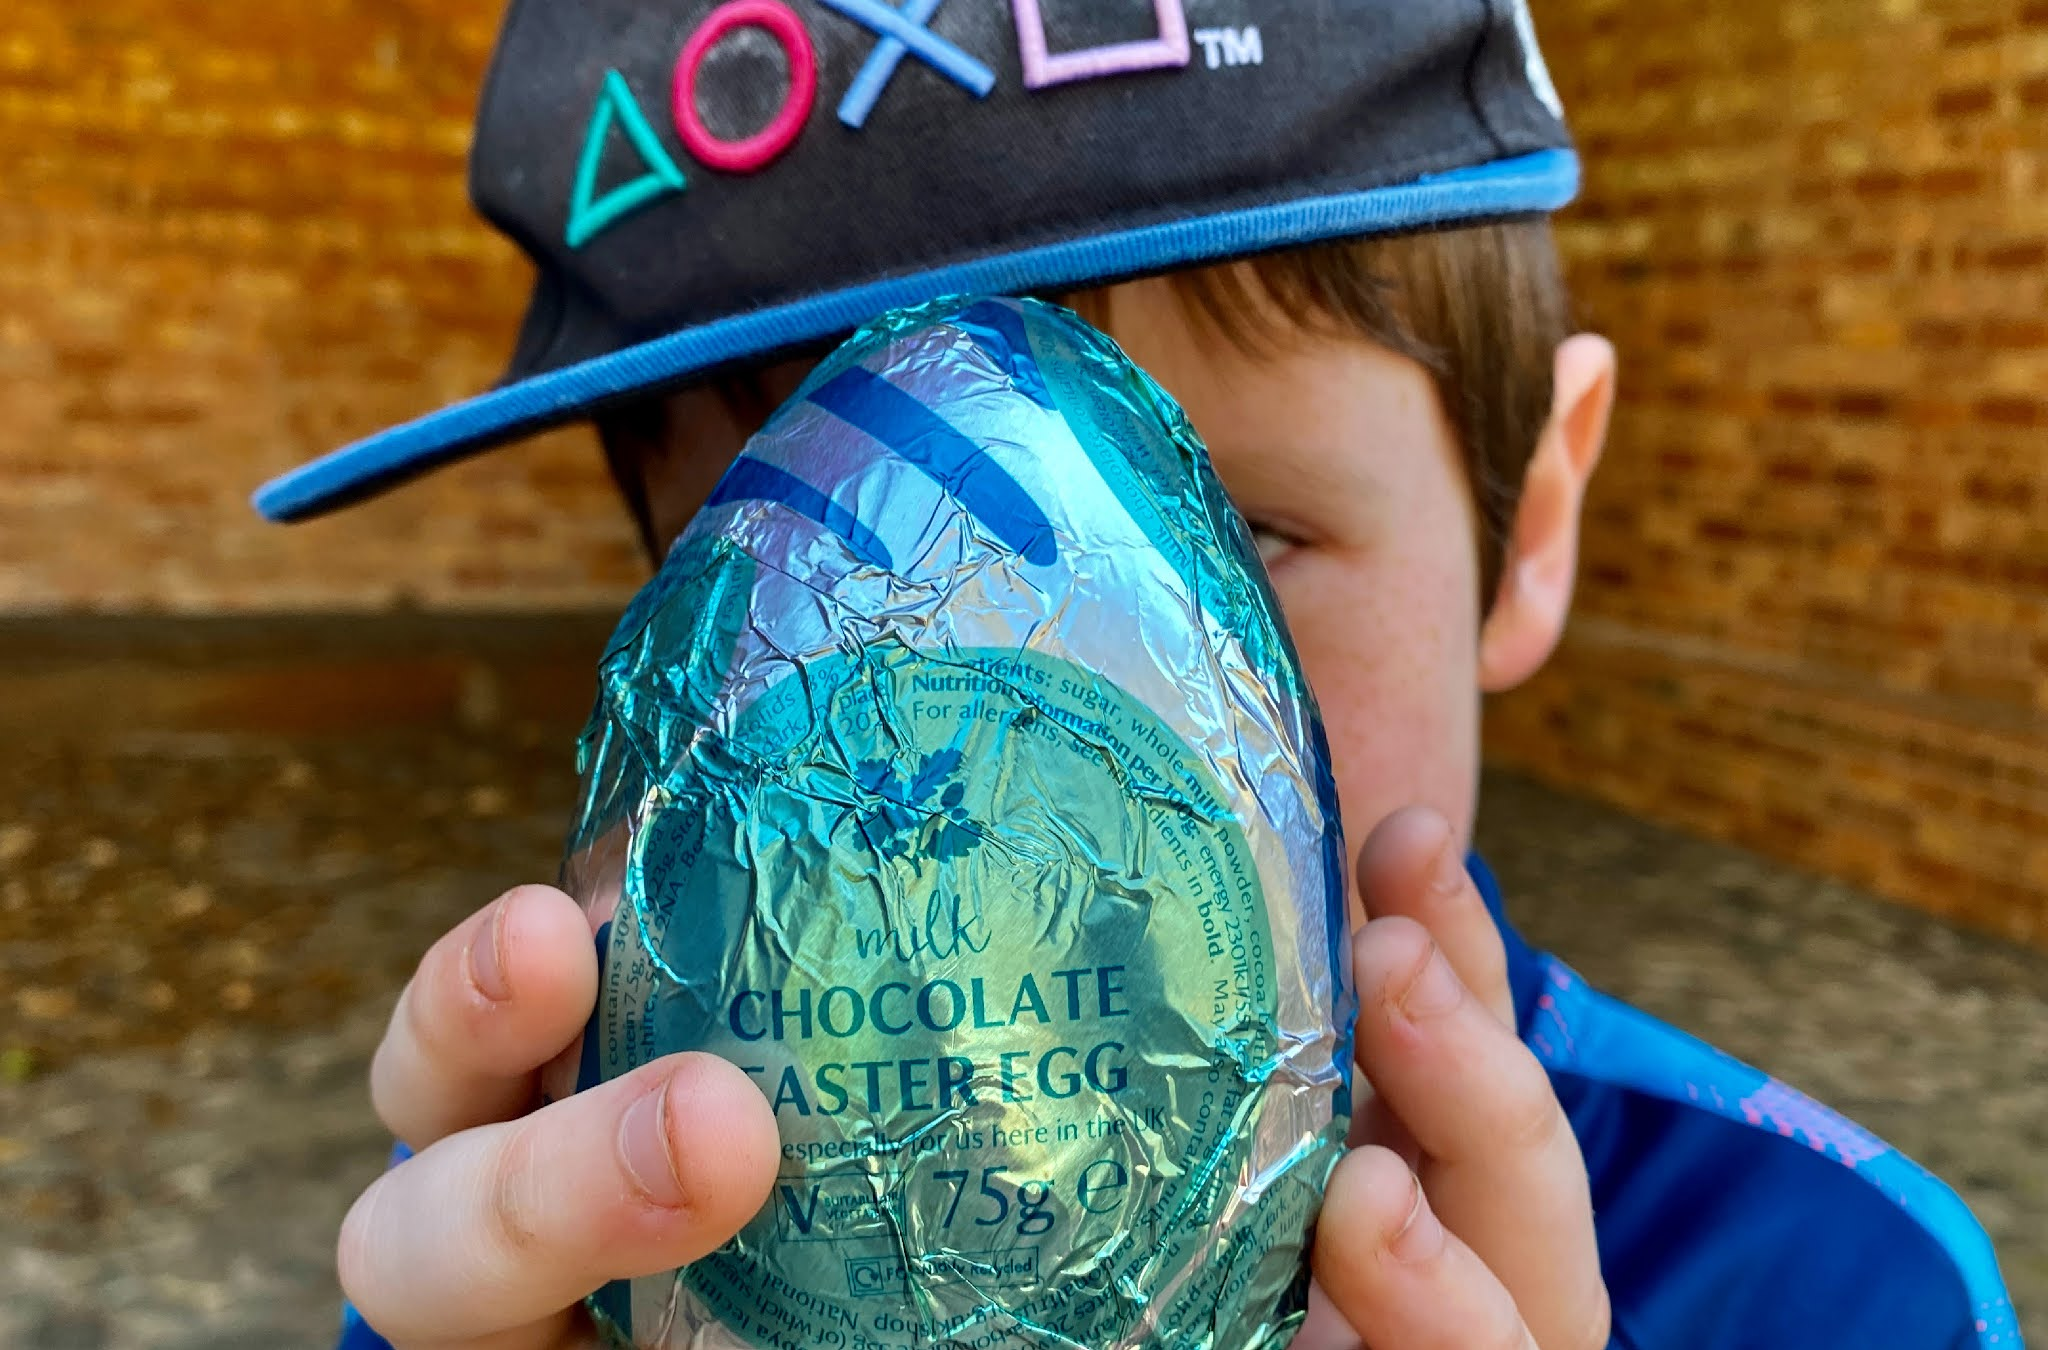 Boy holding an Easter egg